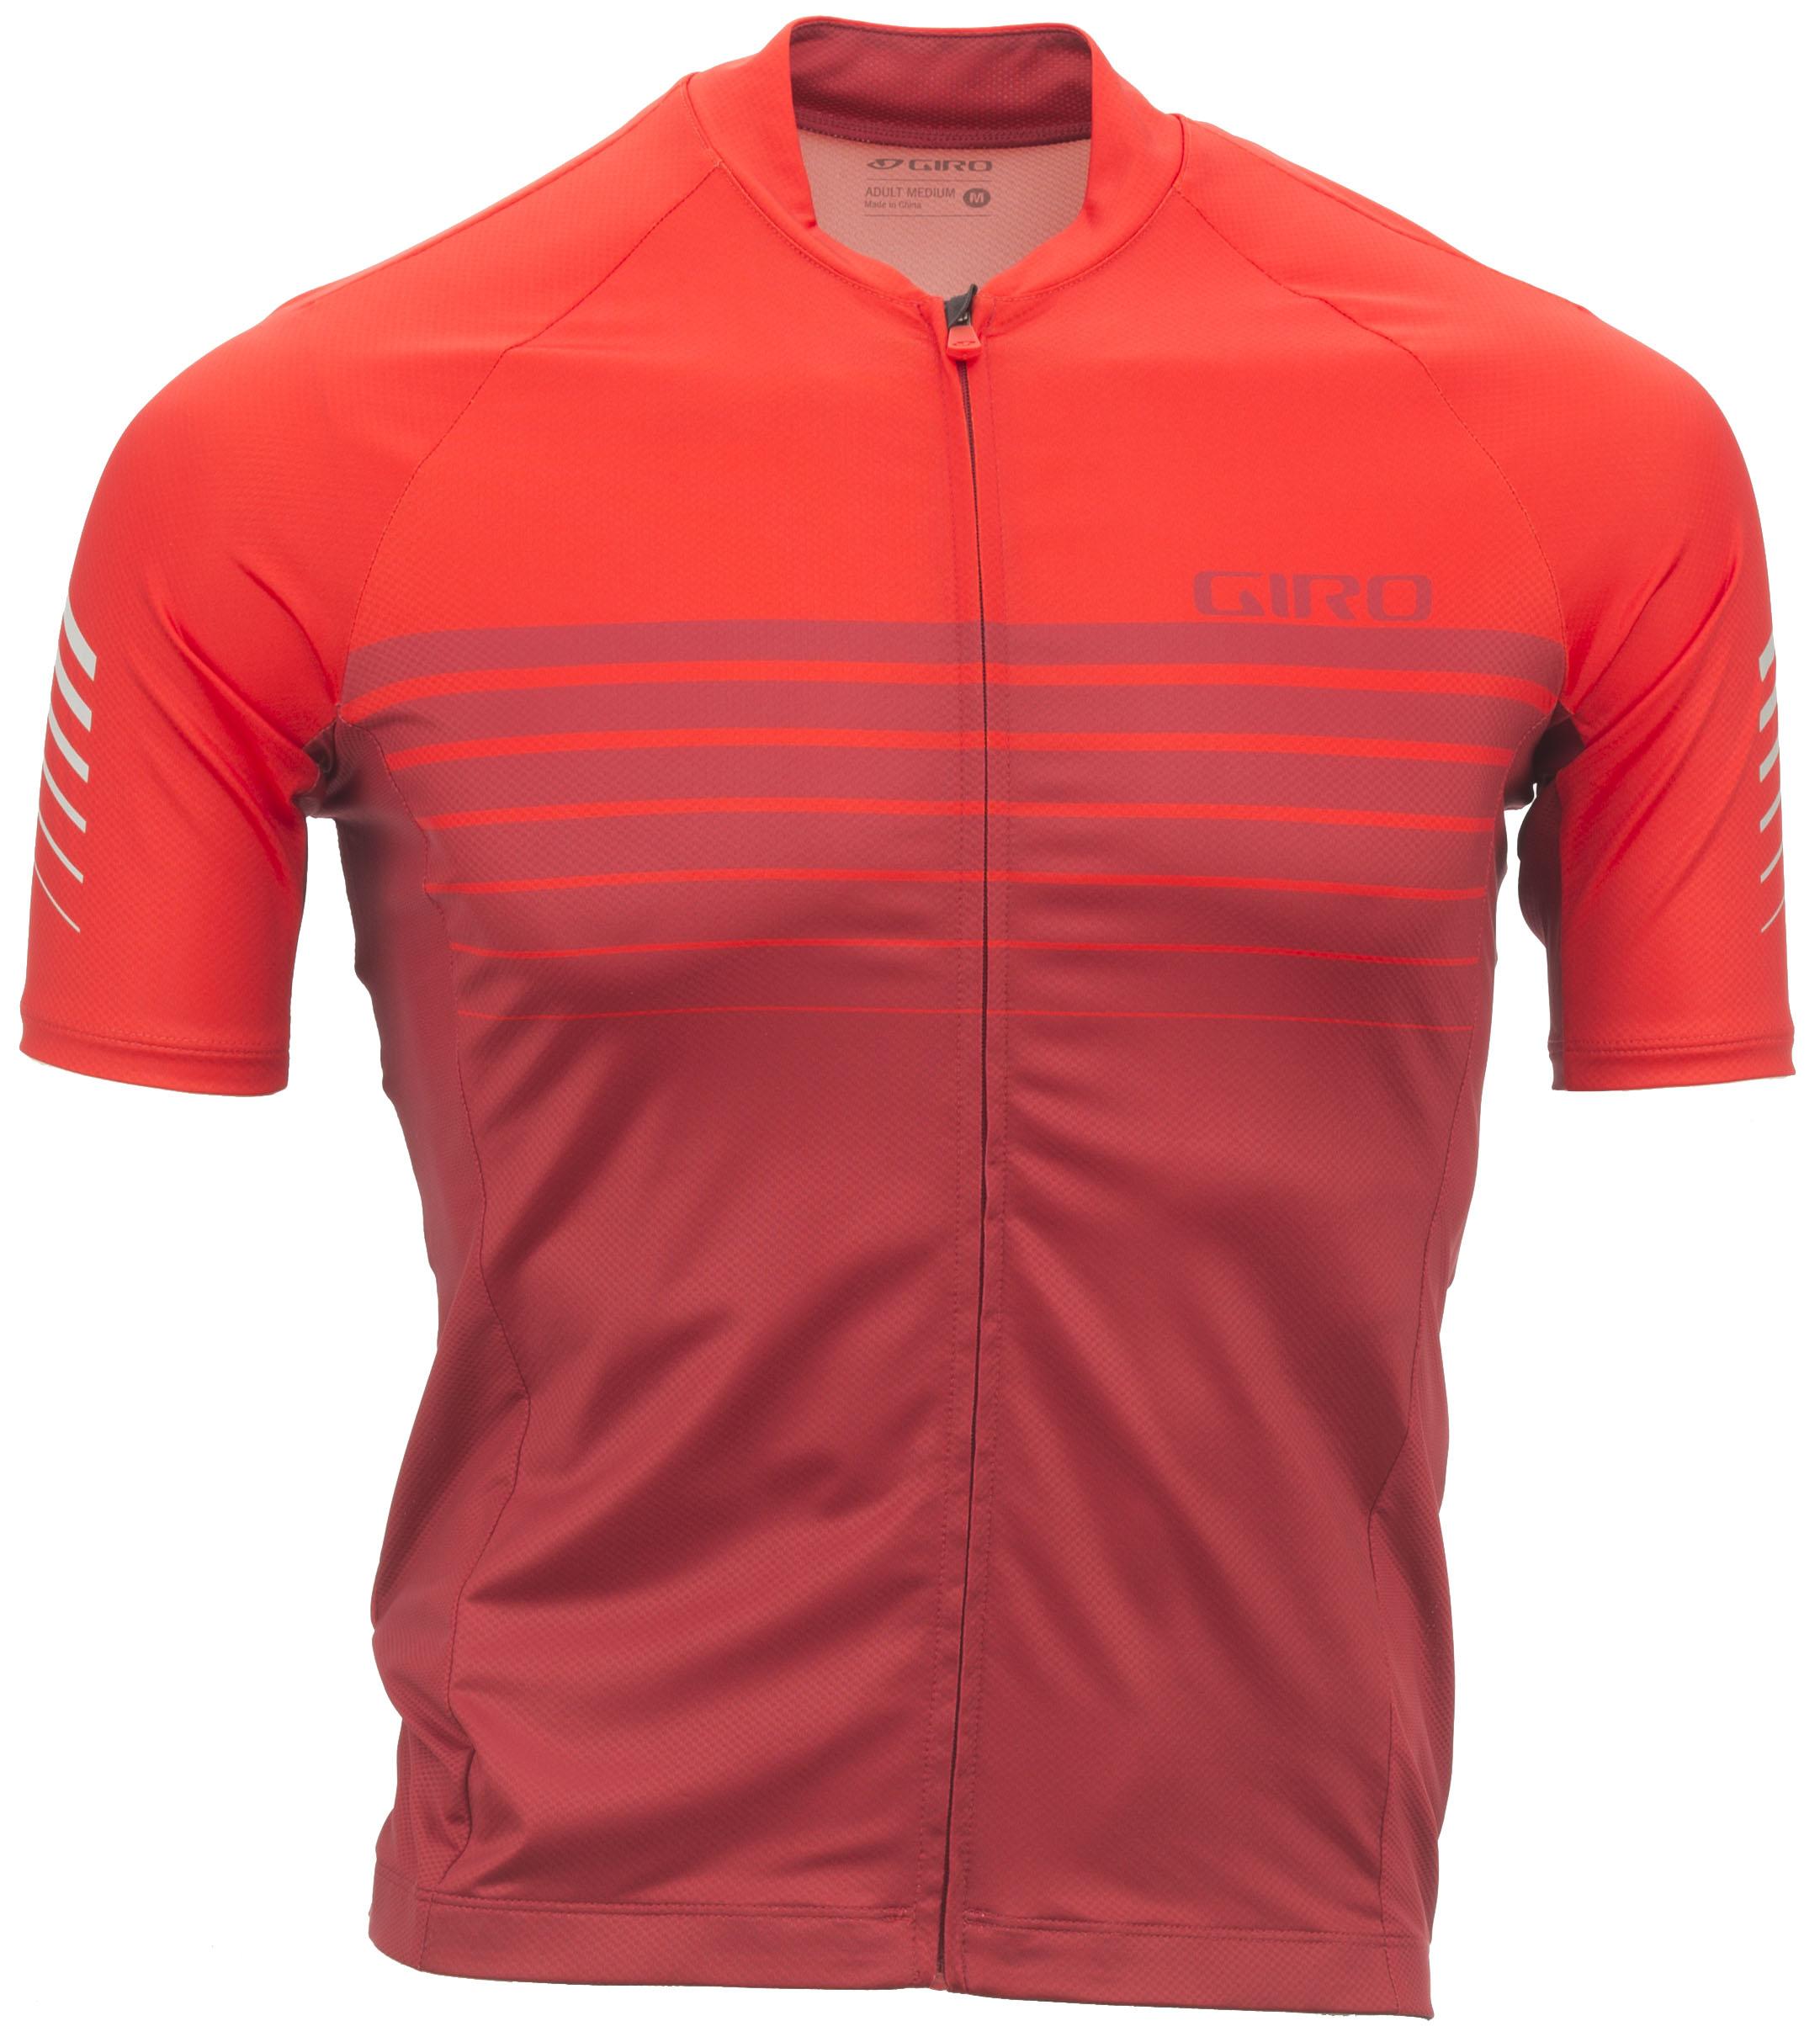 Giro Chrono Expert 6 String Jersey